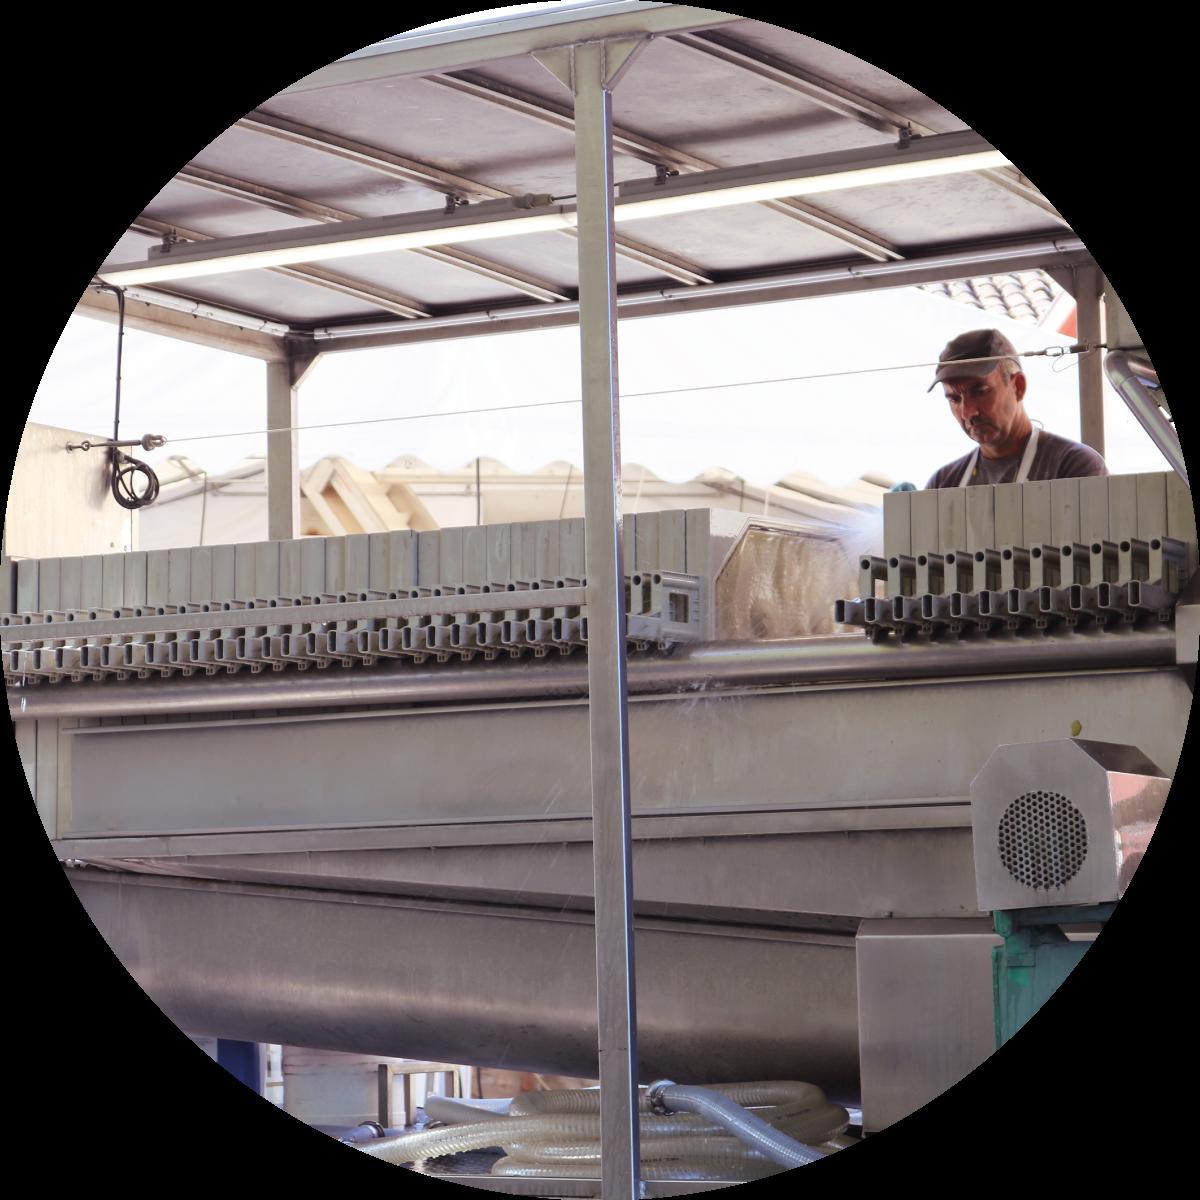 Wine filtration: filter press